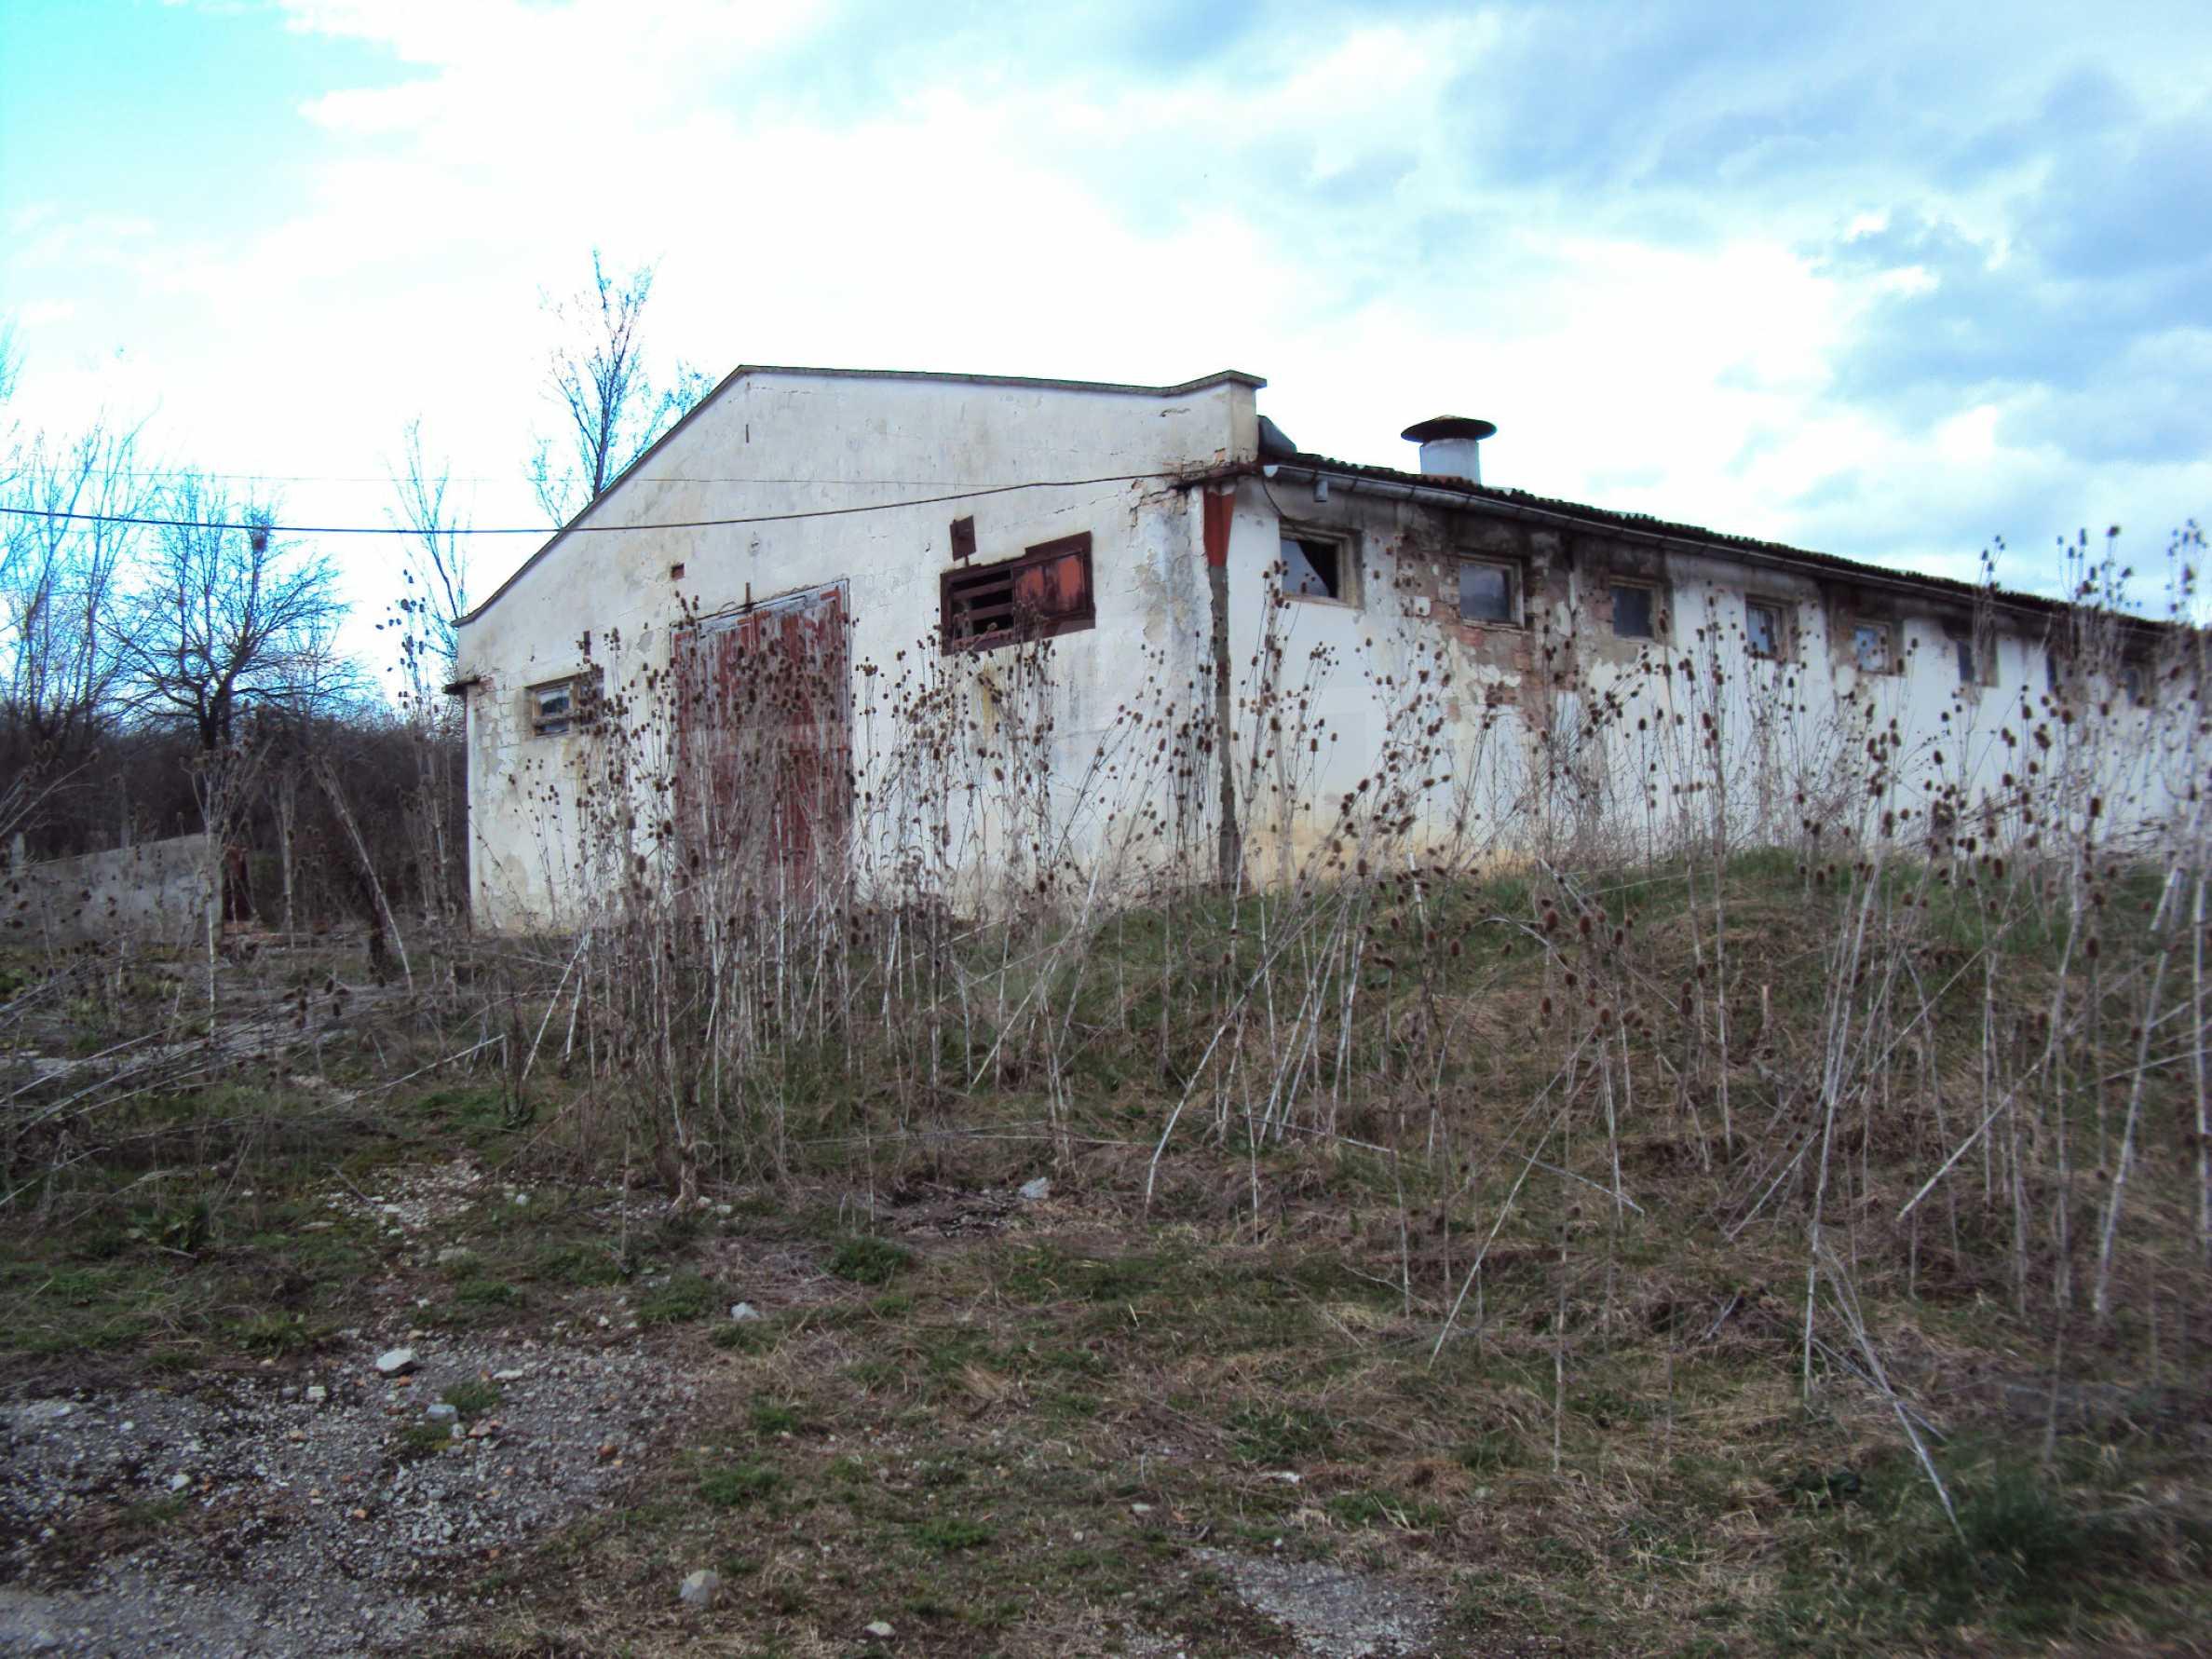 Farm in a small town 24 km from Veliko Tarnovo 16